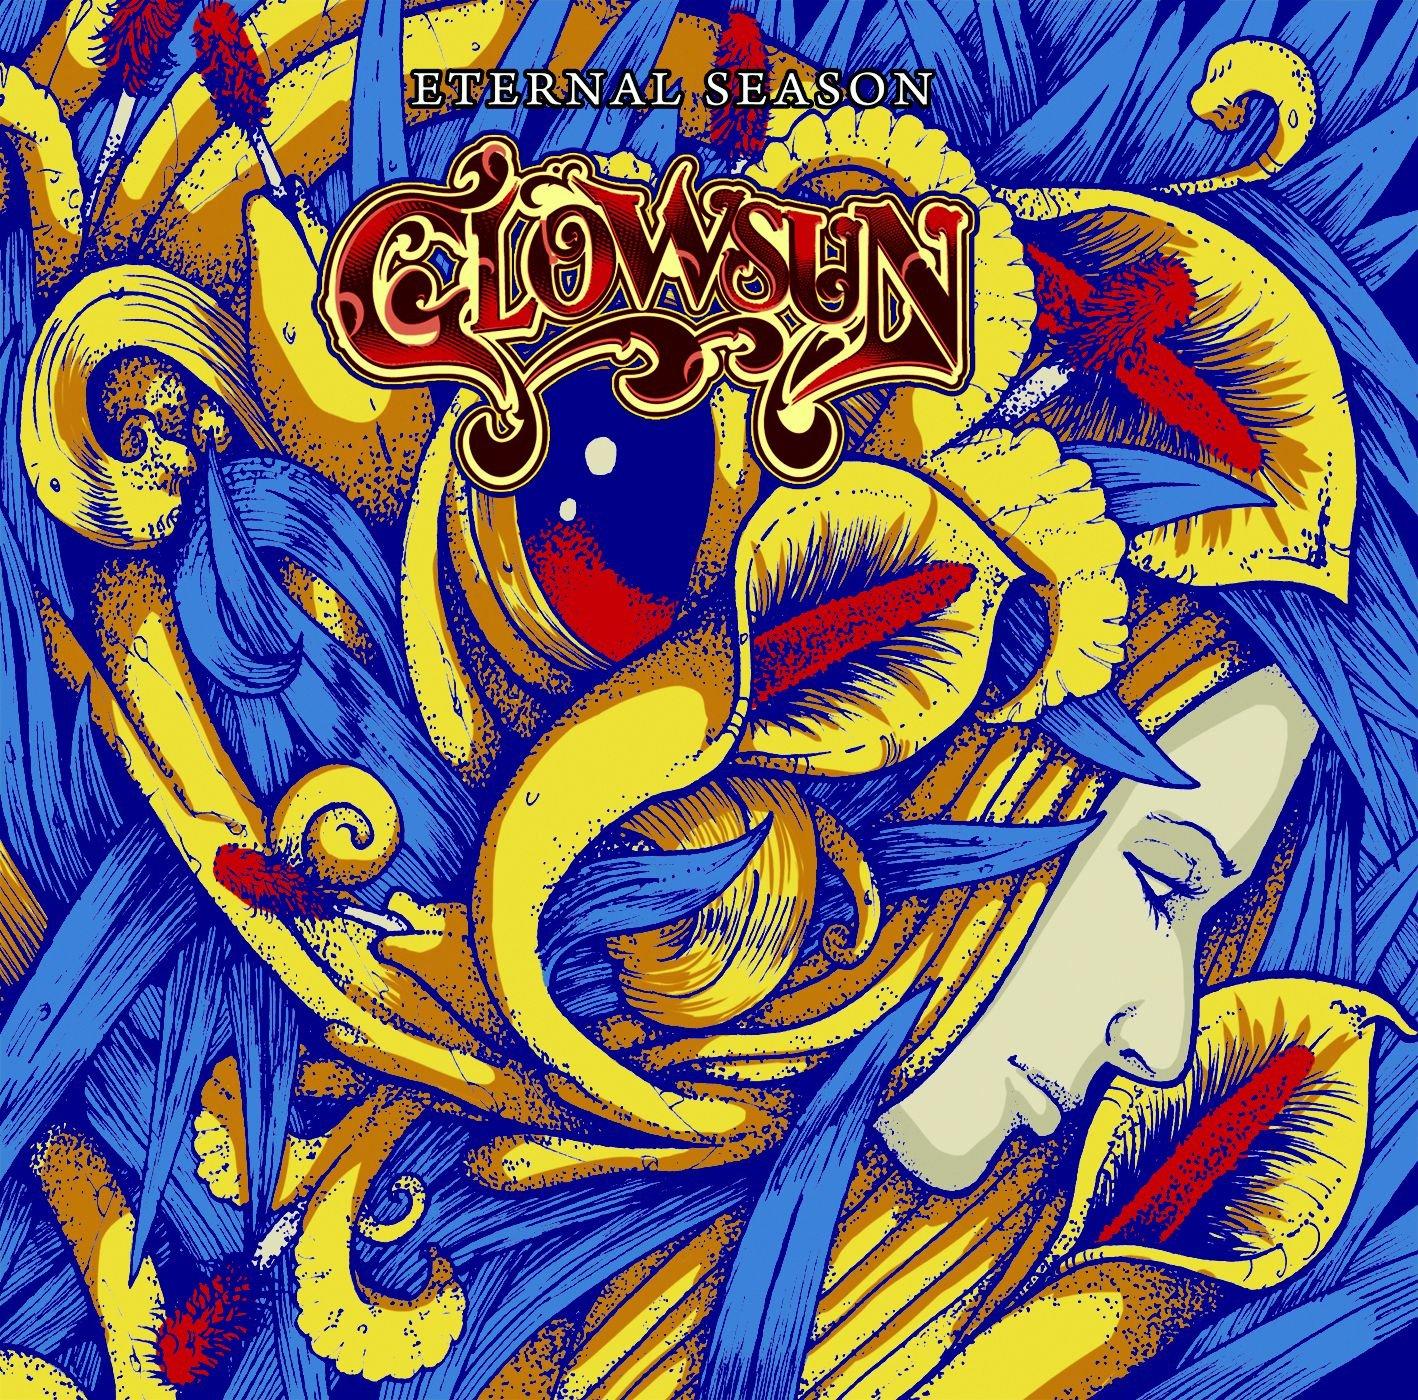 GLOWSUN - Eternal Season